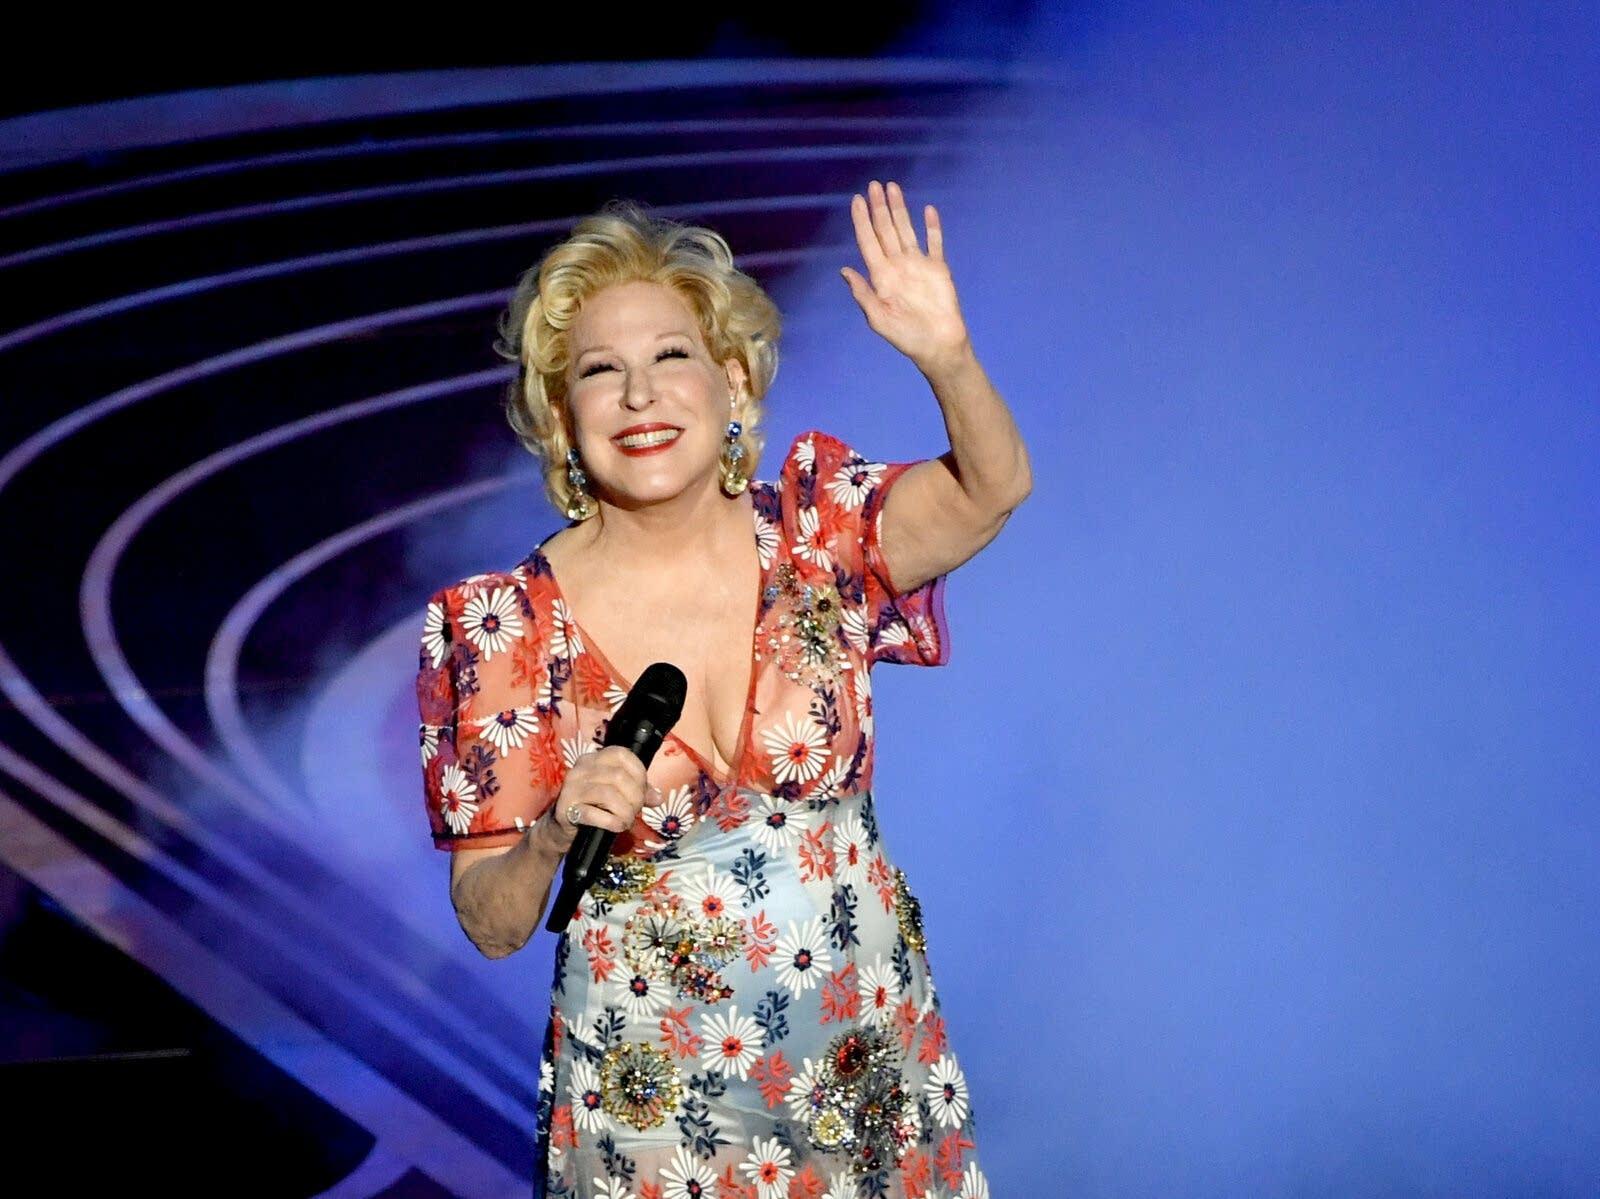 Bette Midler performing in Hollywood in 2019